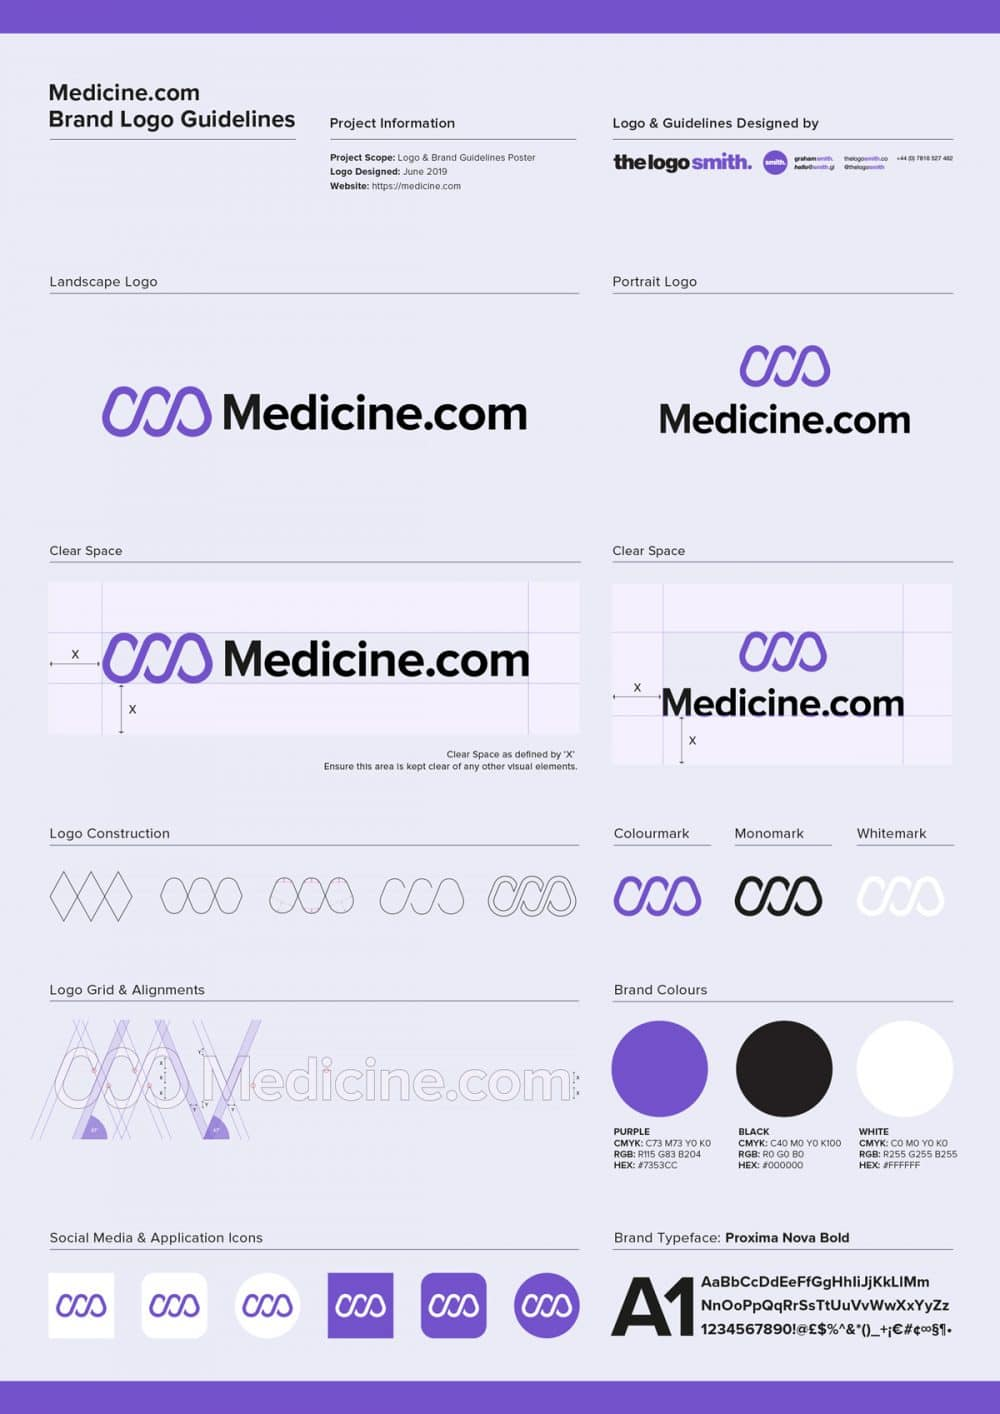 Brand Logo Guidelines Poster Designed by Freelance Logo Designer The Logo Smith